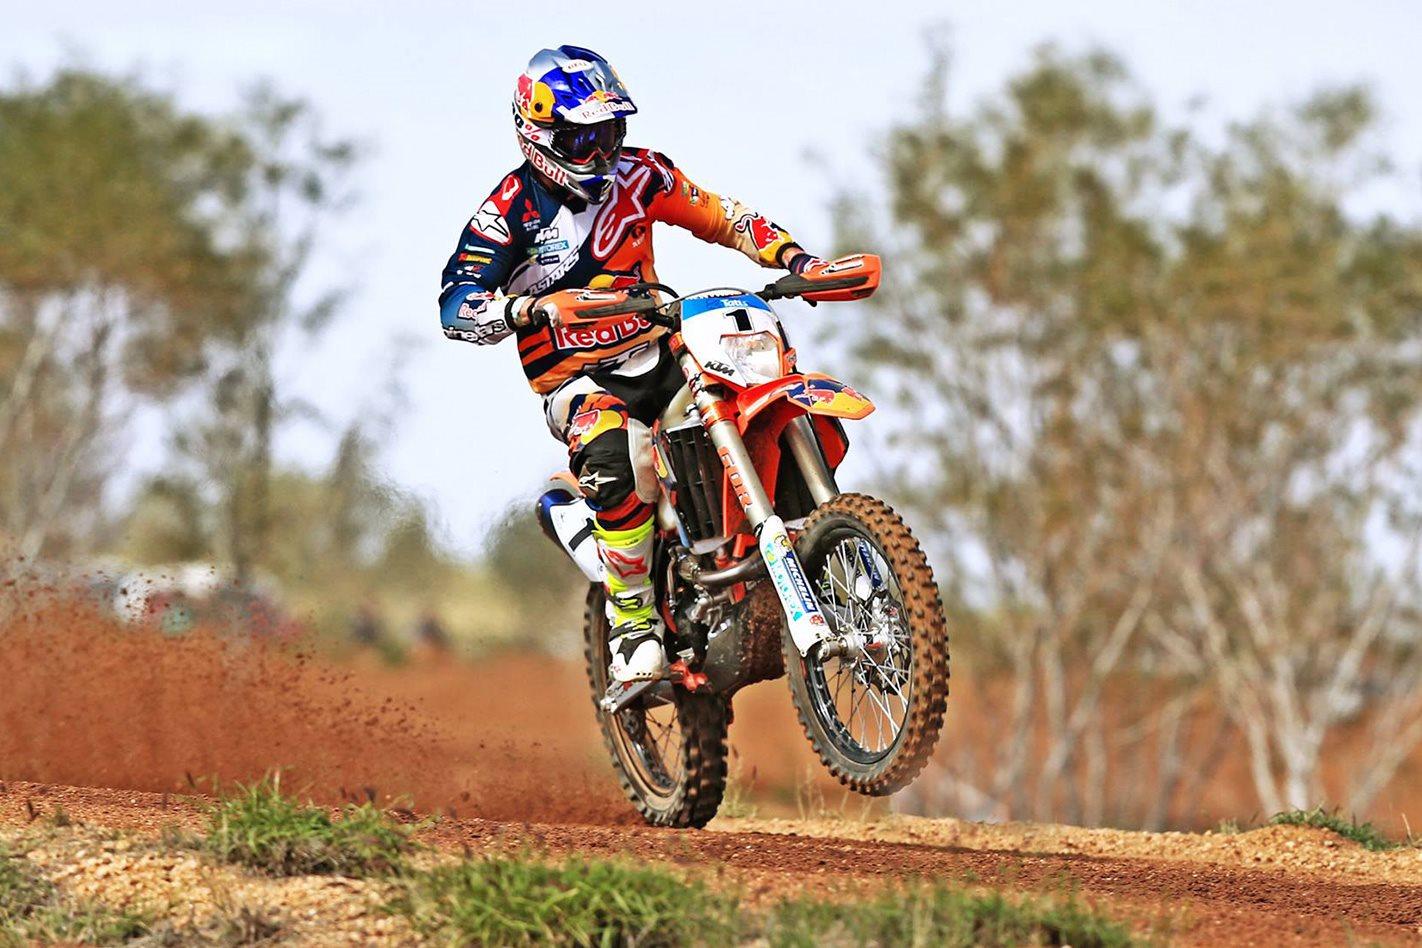 Toby Price Wins 2016 Finke Desert Race